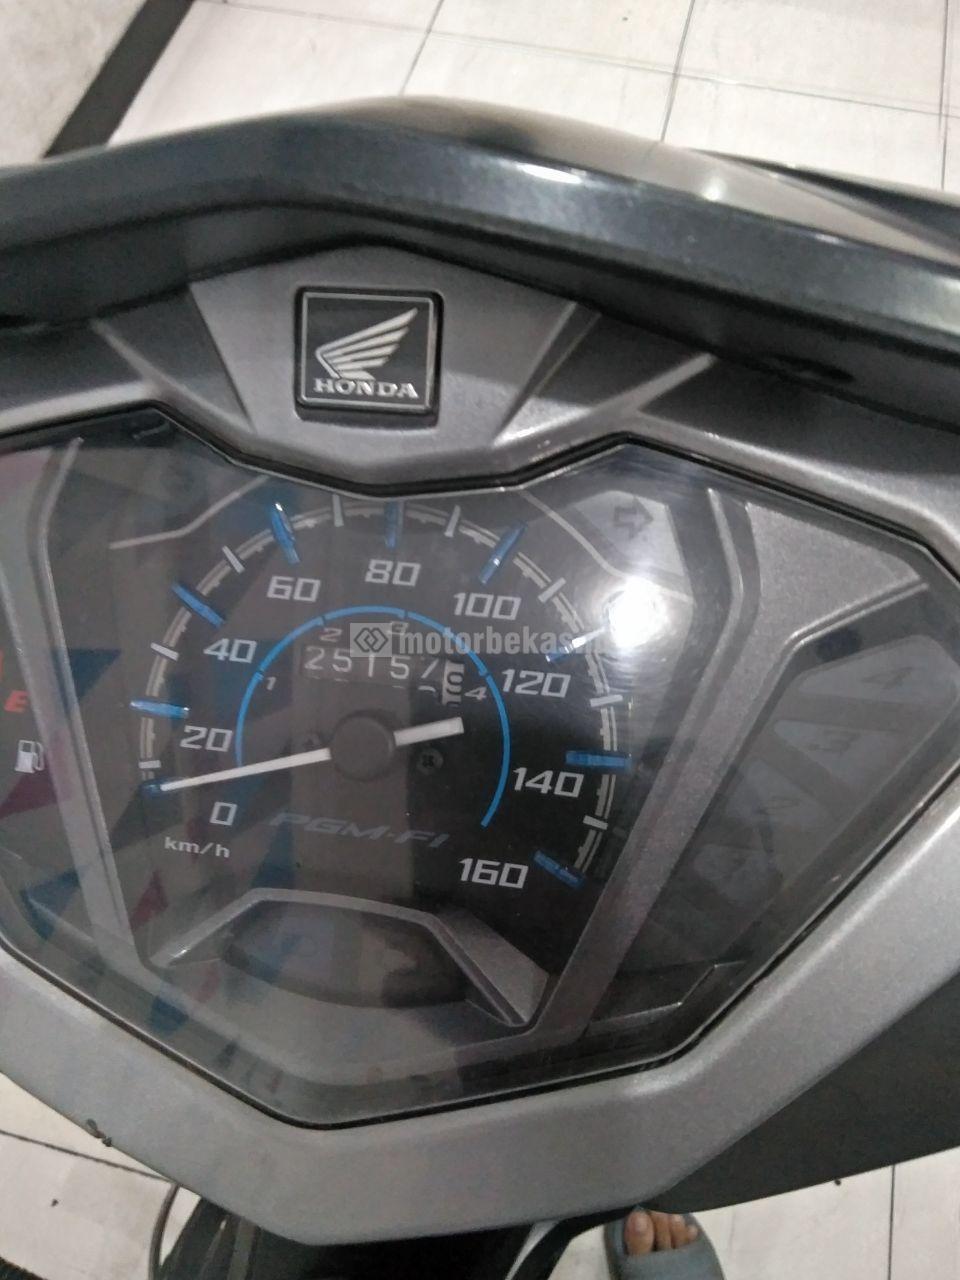 HONDA SUPRA X 125D  3382 motorbekas.id